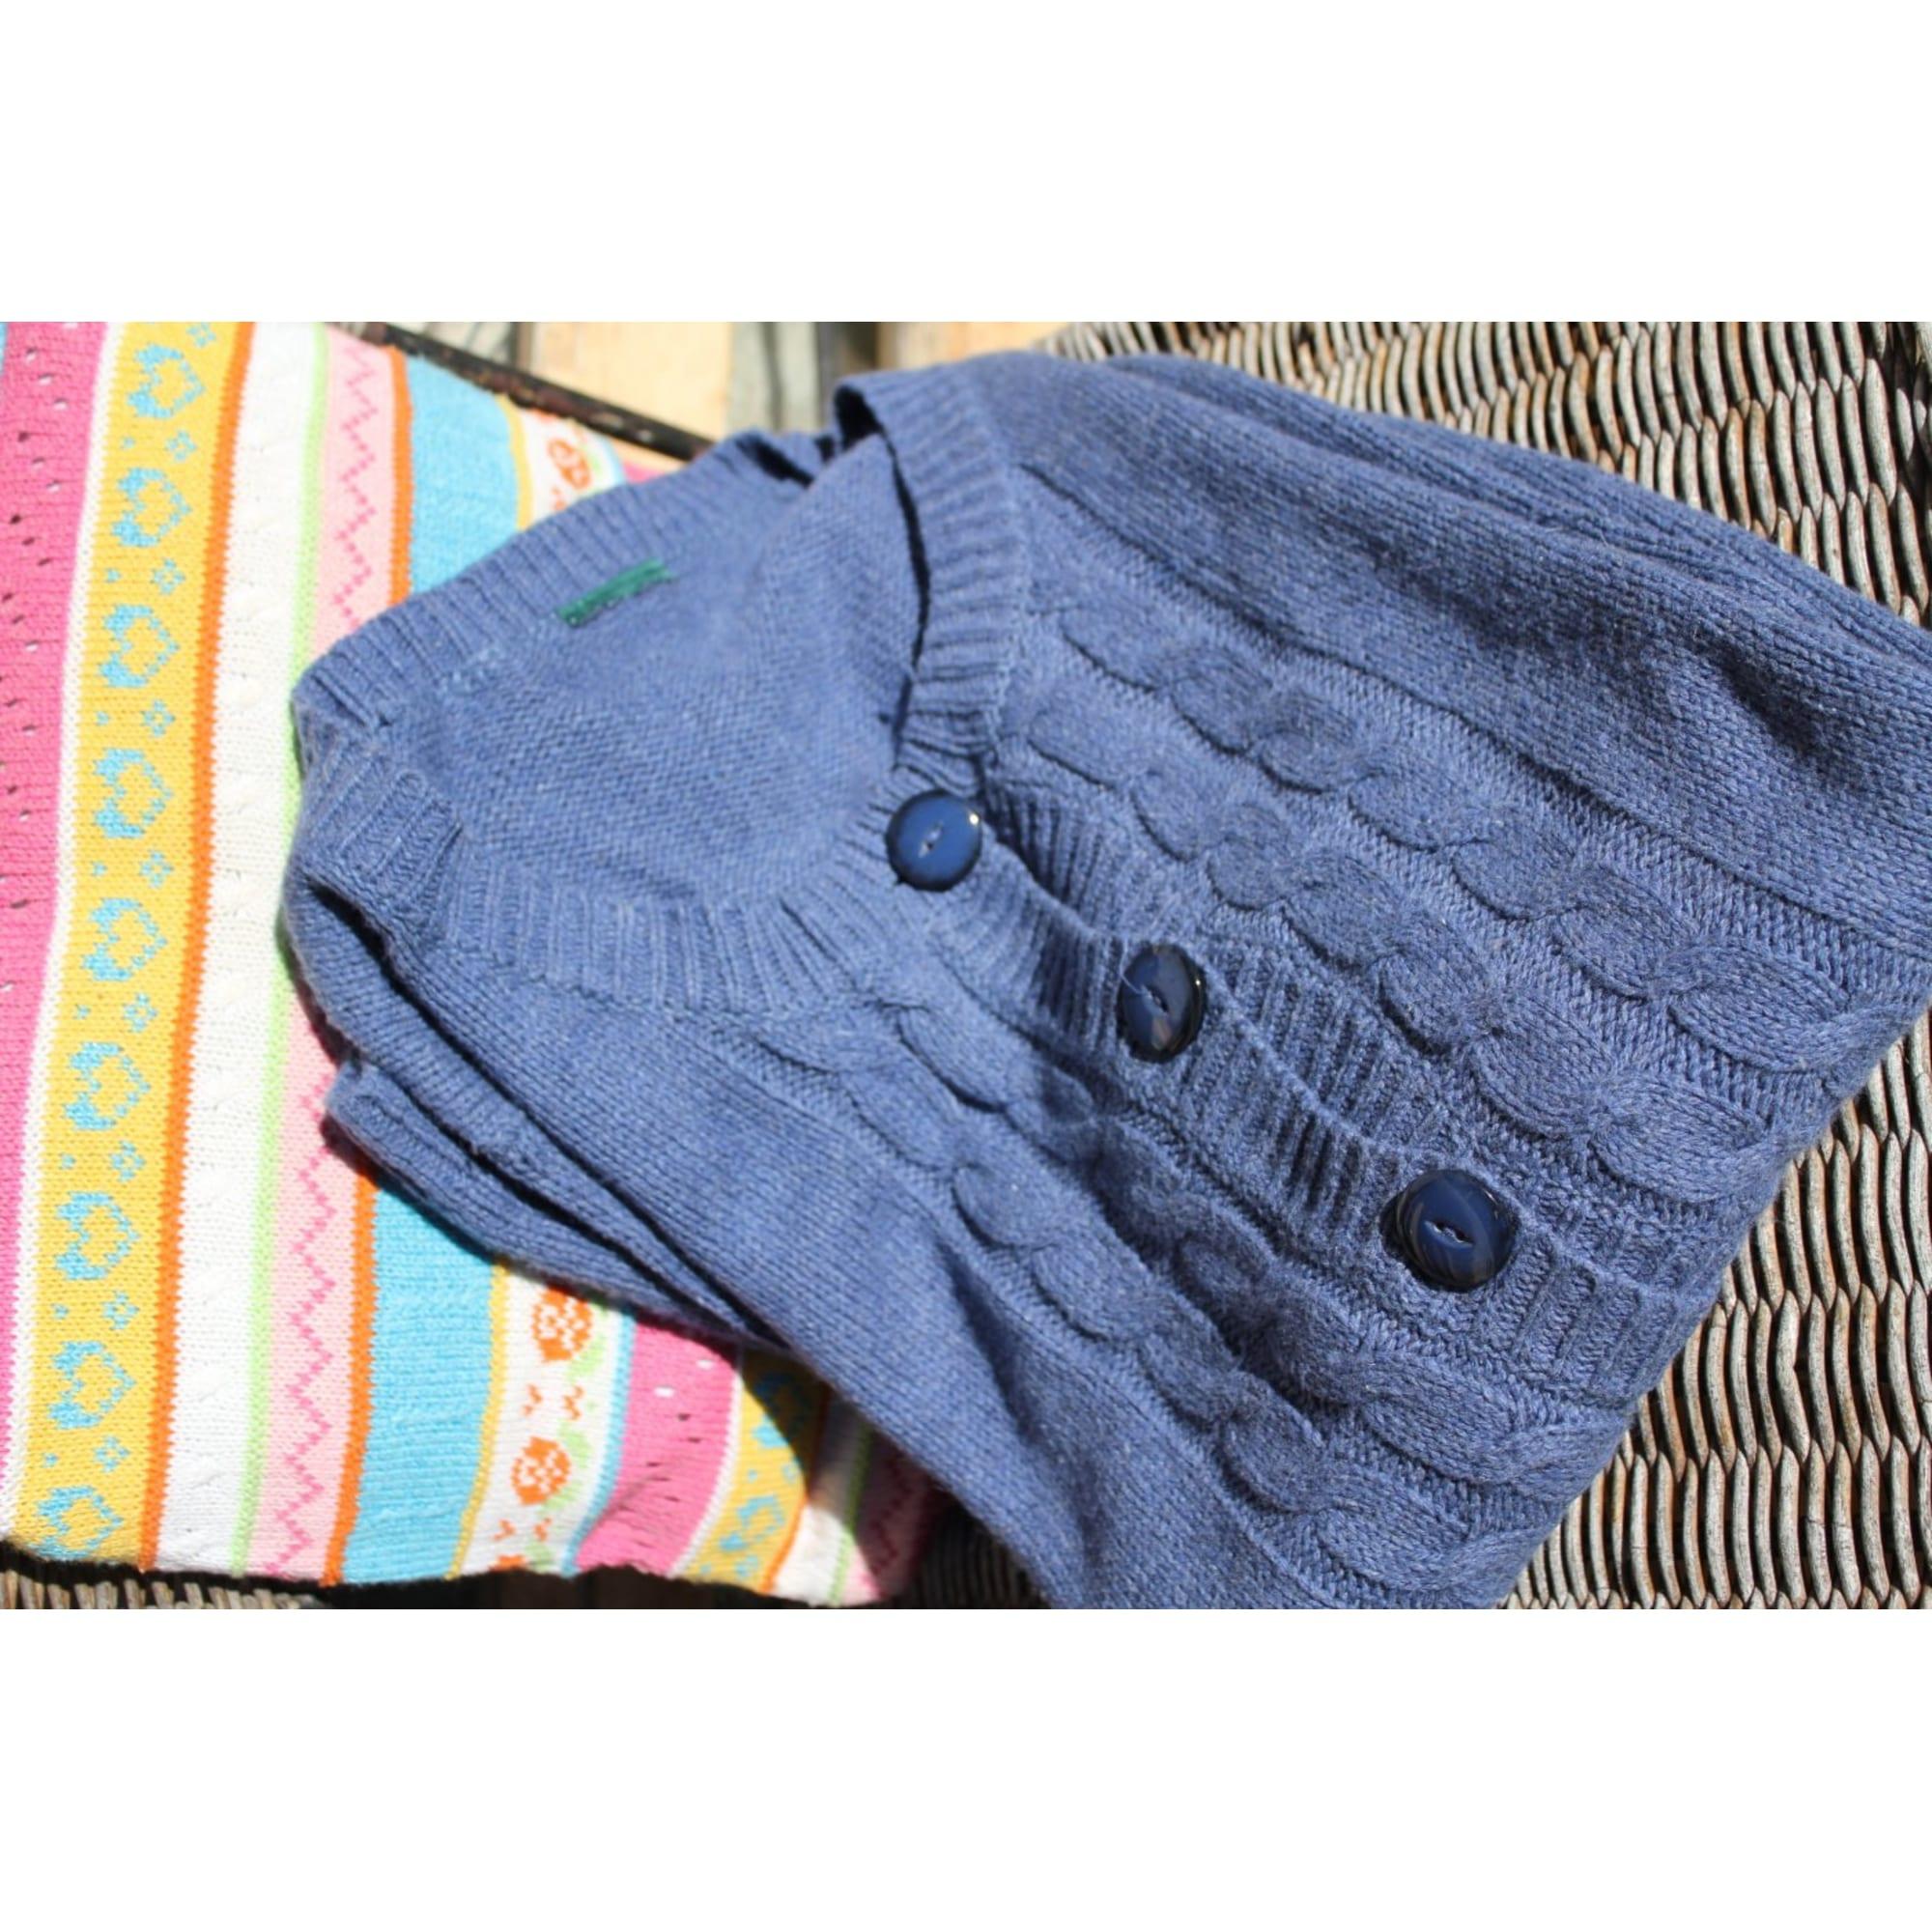 Gilet, cardigan MARC O'POLO Bleu, bleu marine, bleu turquoise